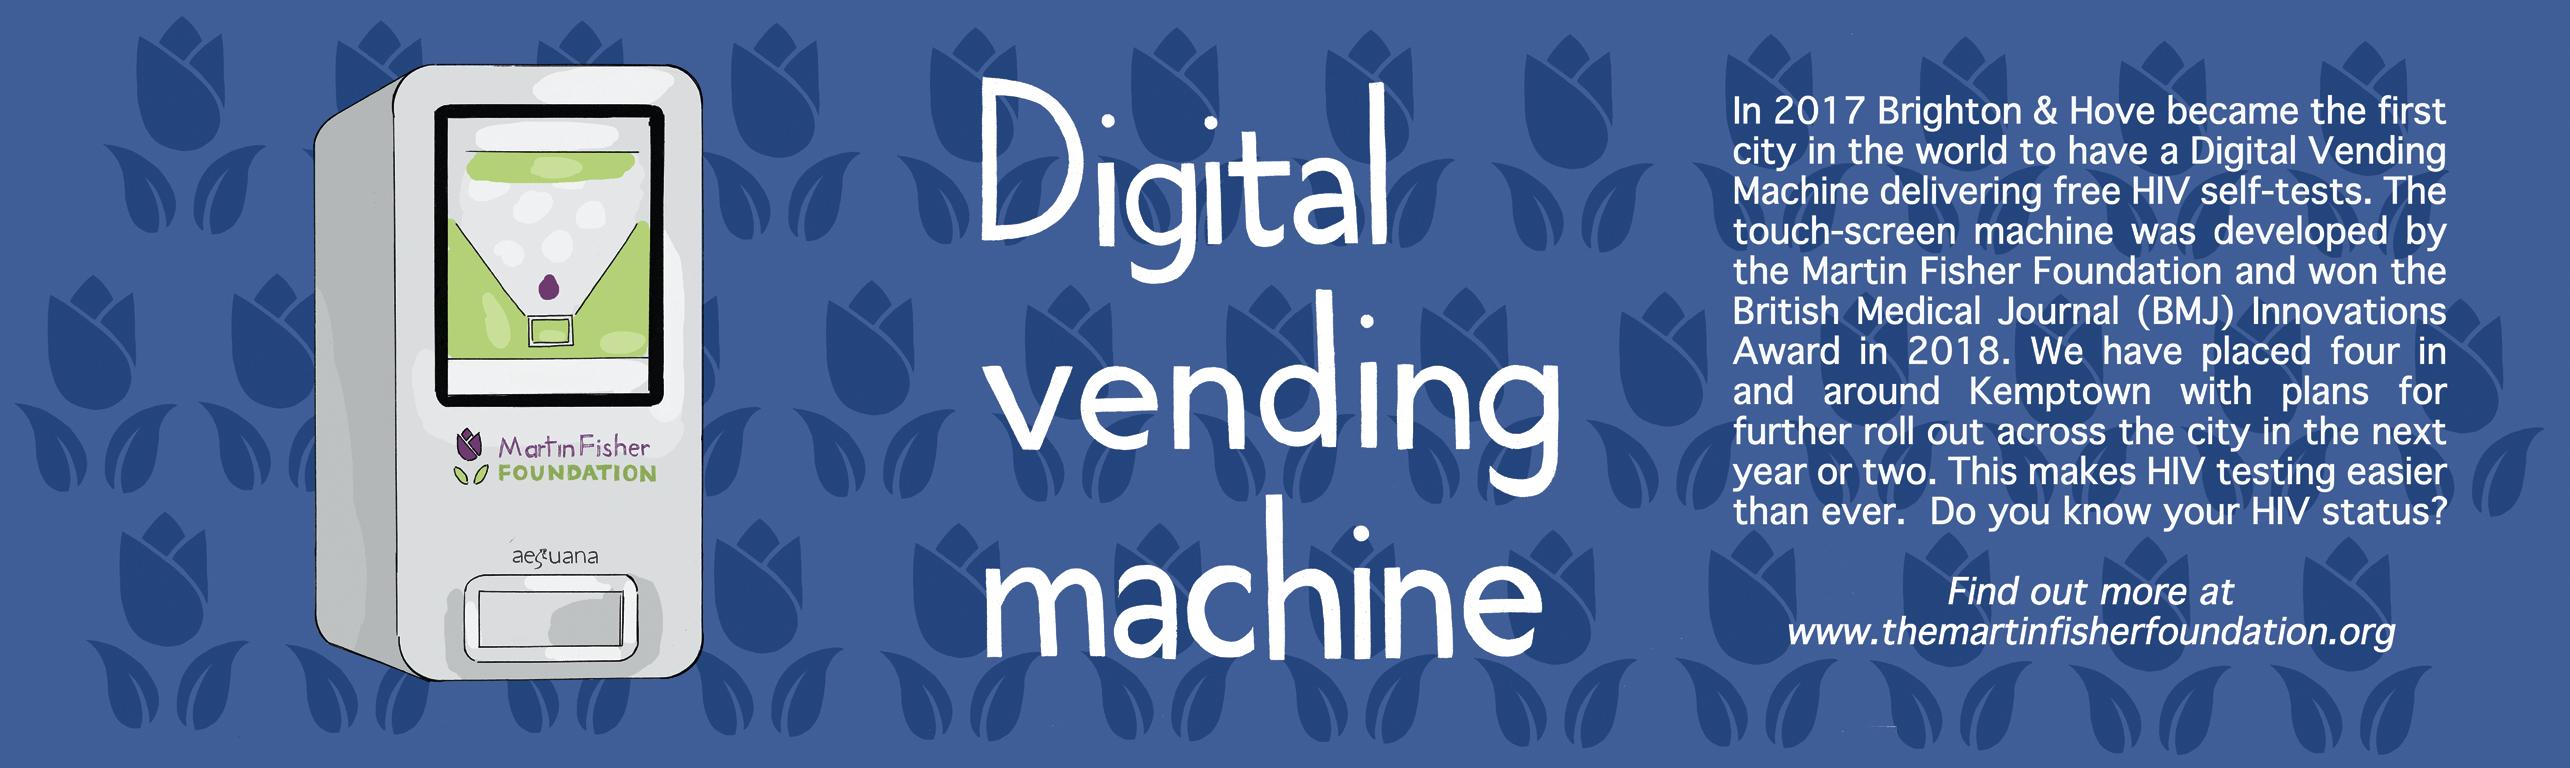 NS1 (Vending Machine) INTERNET